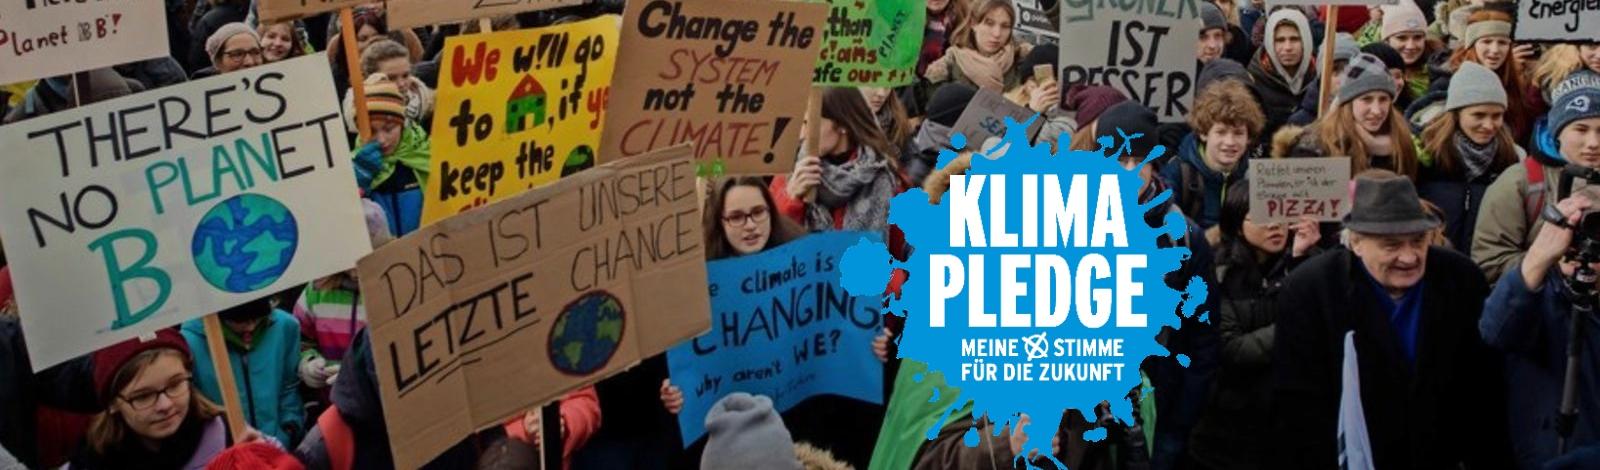 Klima Pledge